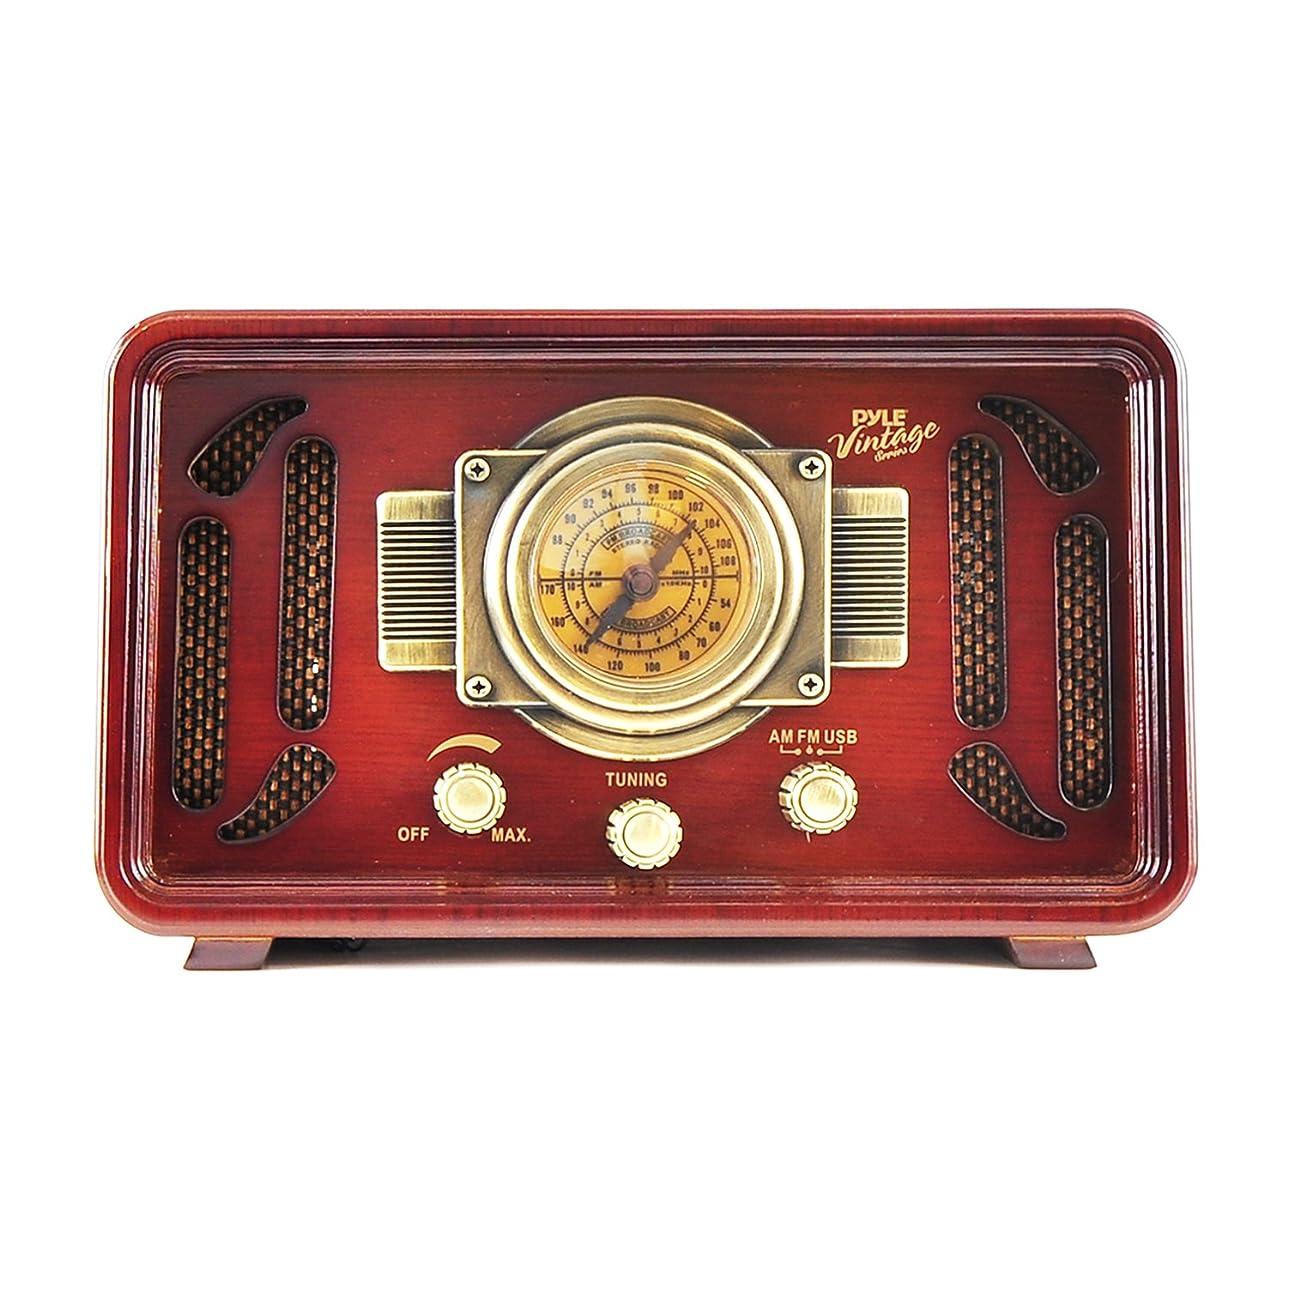 Pyle PUNP34BT Vintage Retro Classic Style Bluetooth Radio Sound System, USB/SD Readers, AM/FM Radio 2